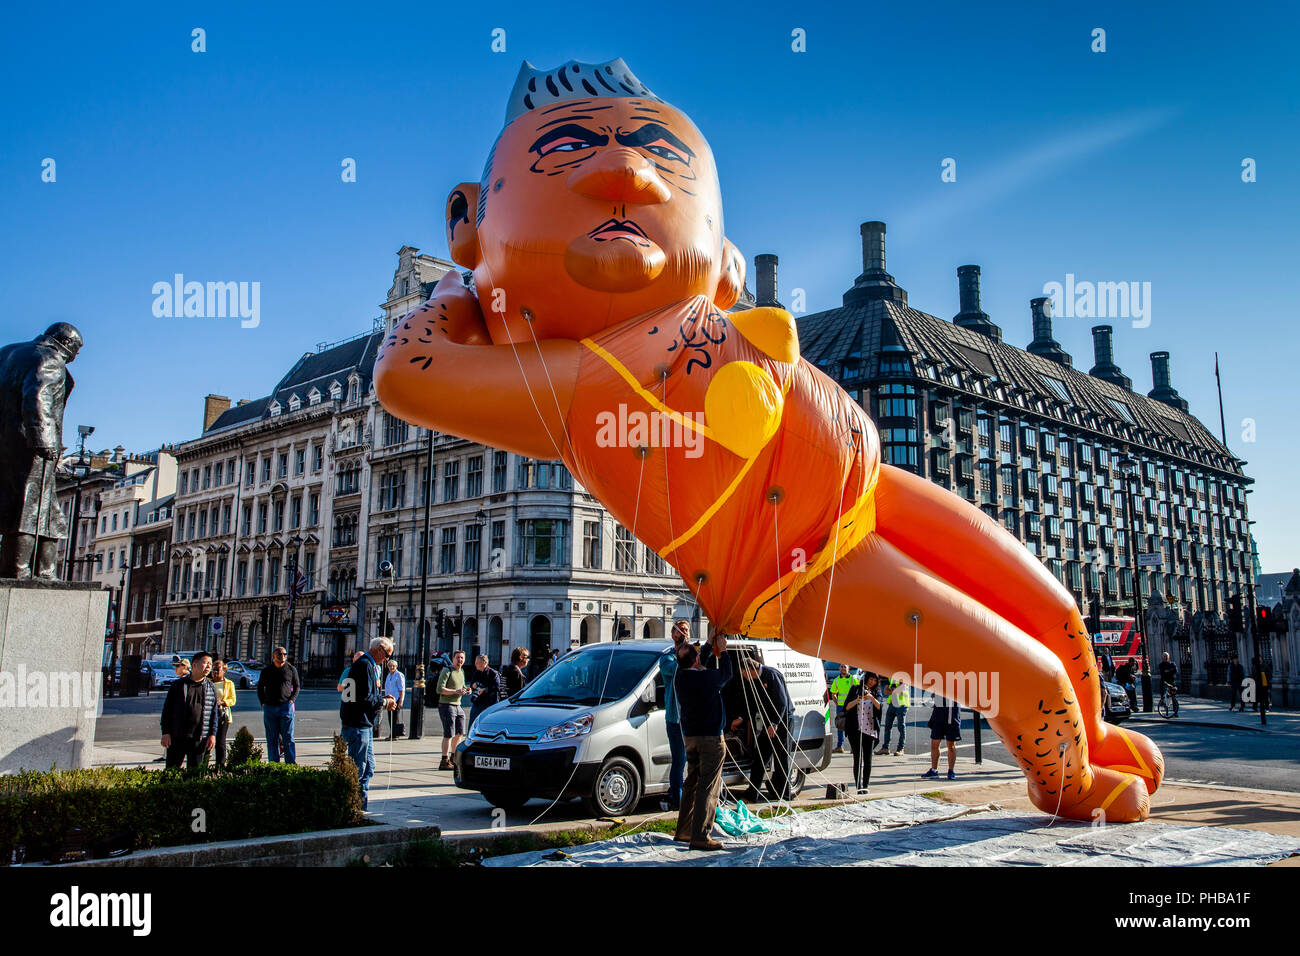 London, UK. 1st September 2018. Protesters fly a 29ft long bikini-clad blimp of London mayor Sadiq Khan over Parliament Square, Westminster. Credit: Grant Rooney/Alamy Live News - Stock Image